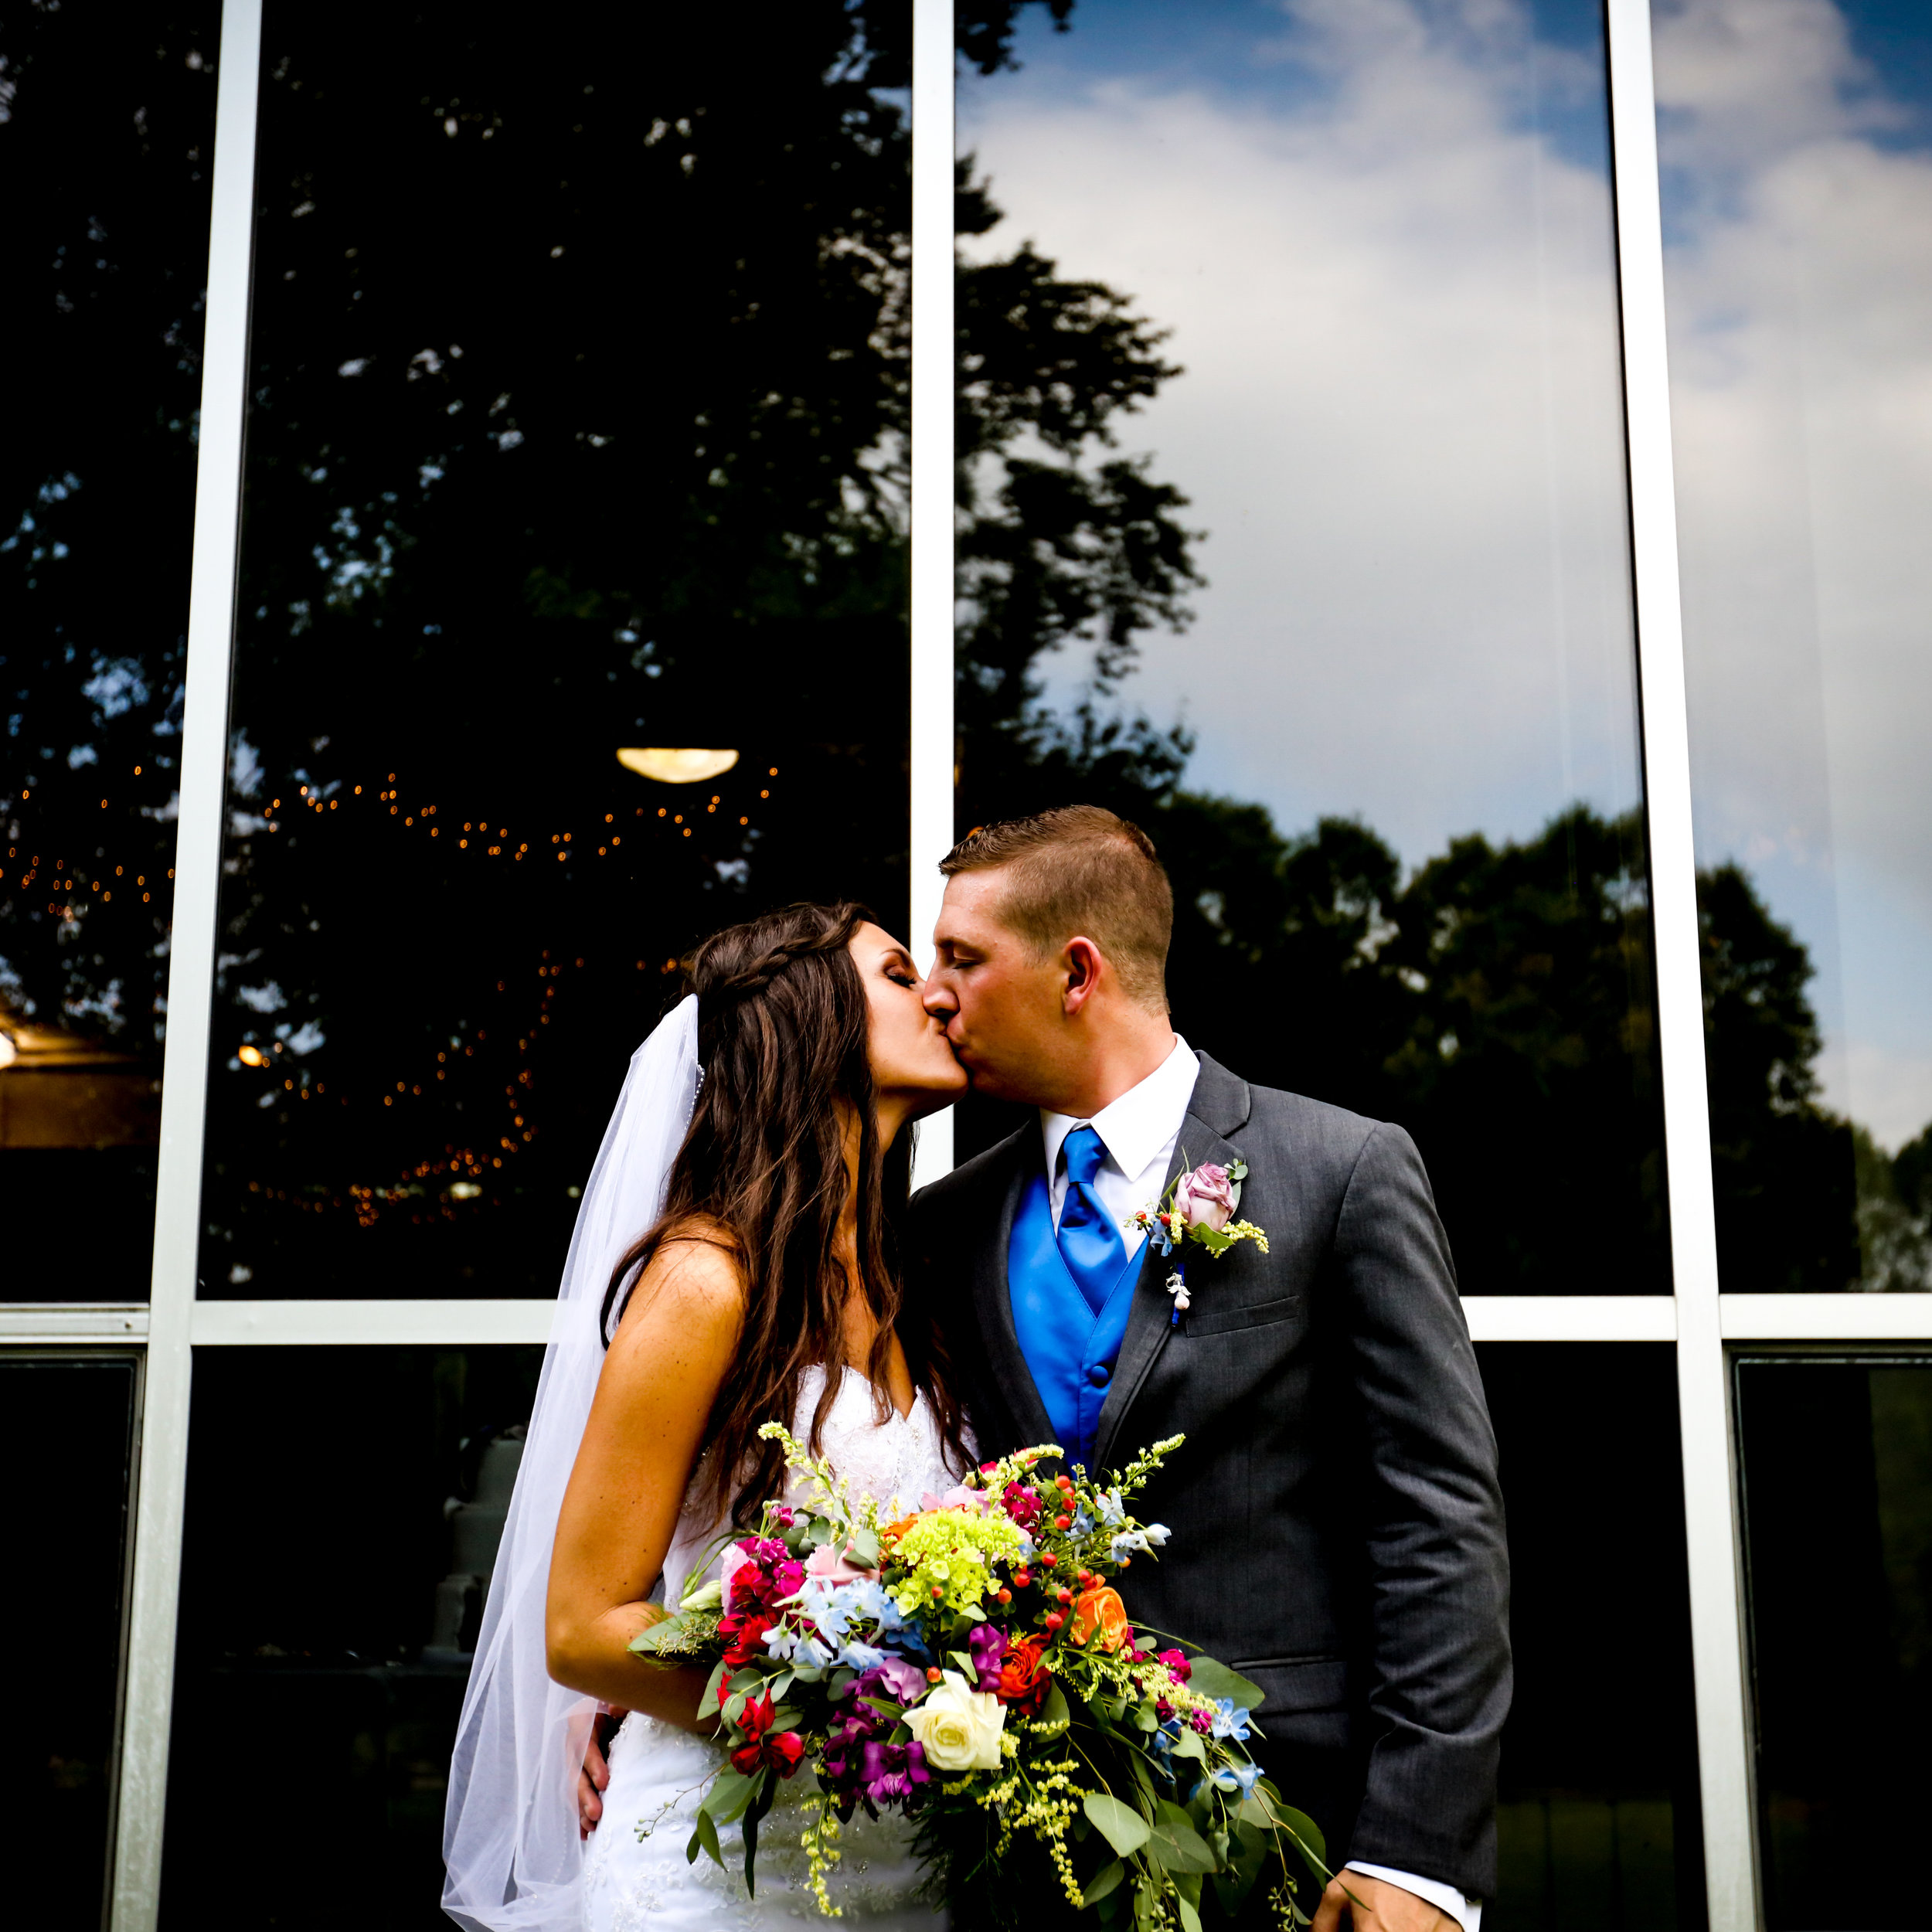 WeddingWebsite-46.jpg